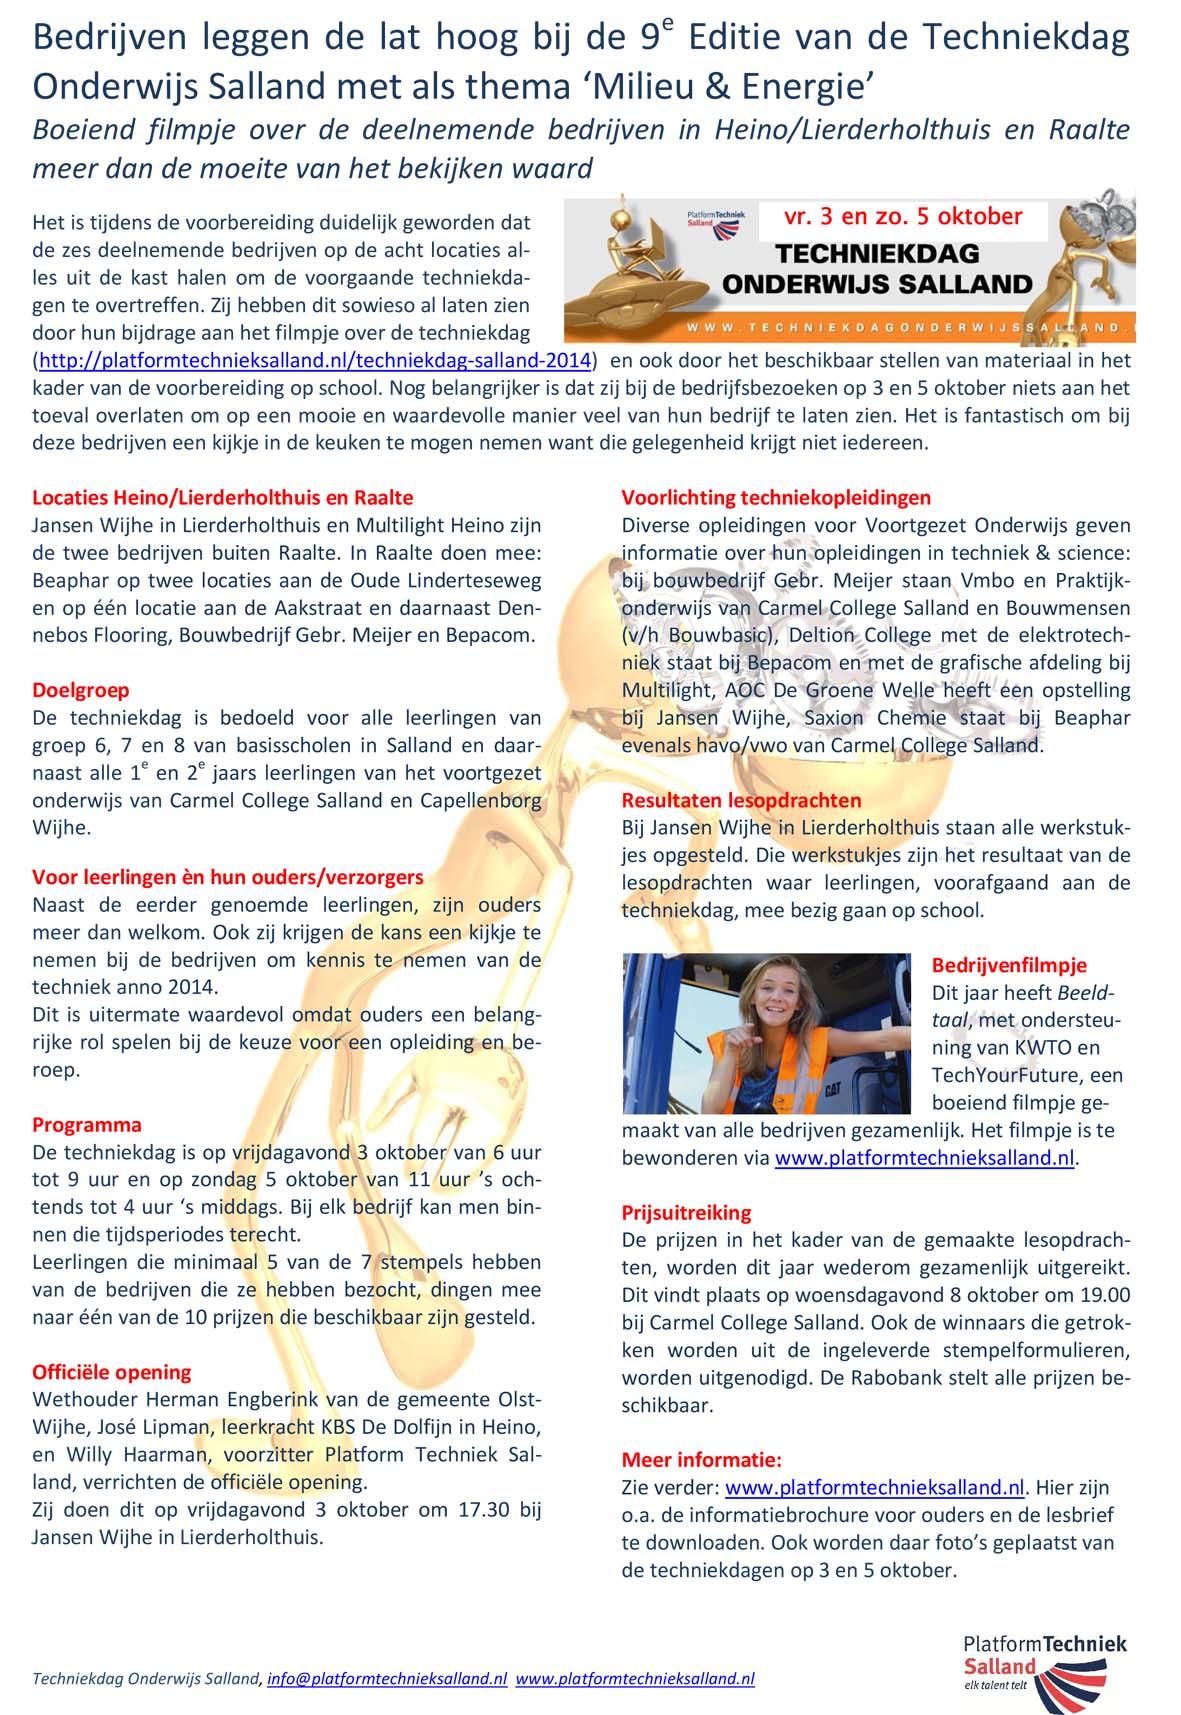 Persbericht - leaflet 2014 TOS-2